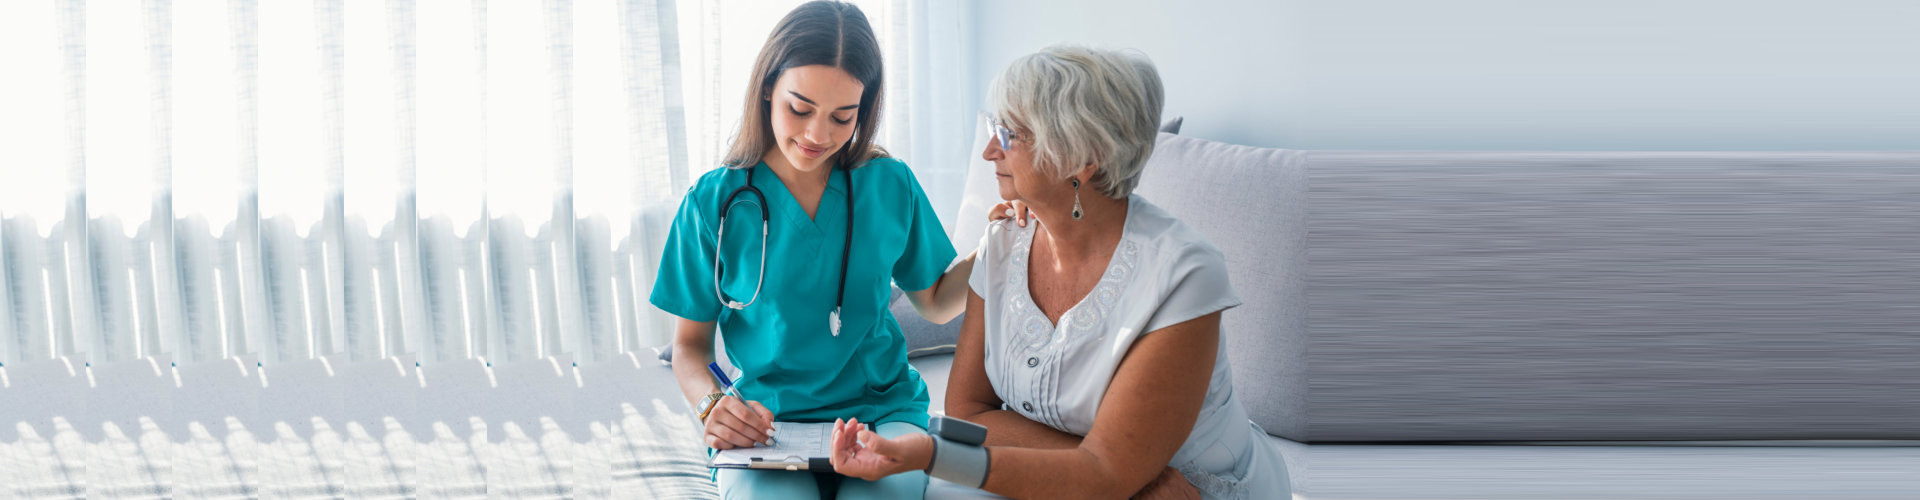 caregiver doing blood pressure monitoring to senior woman